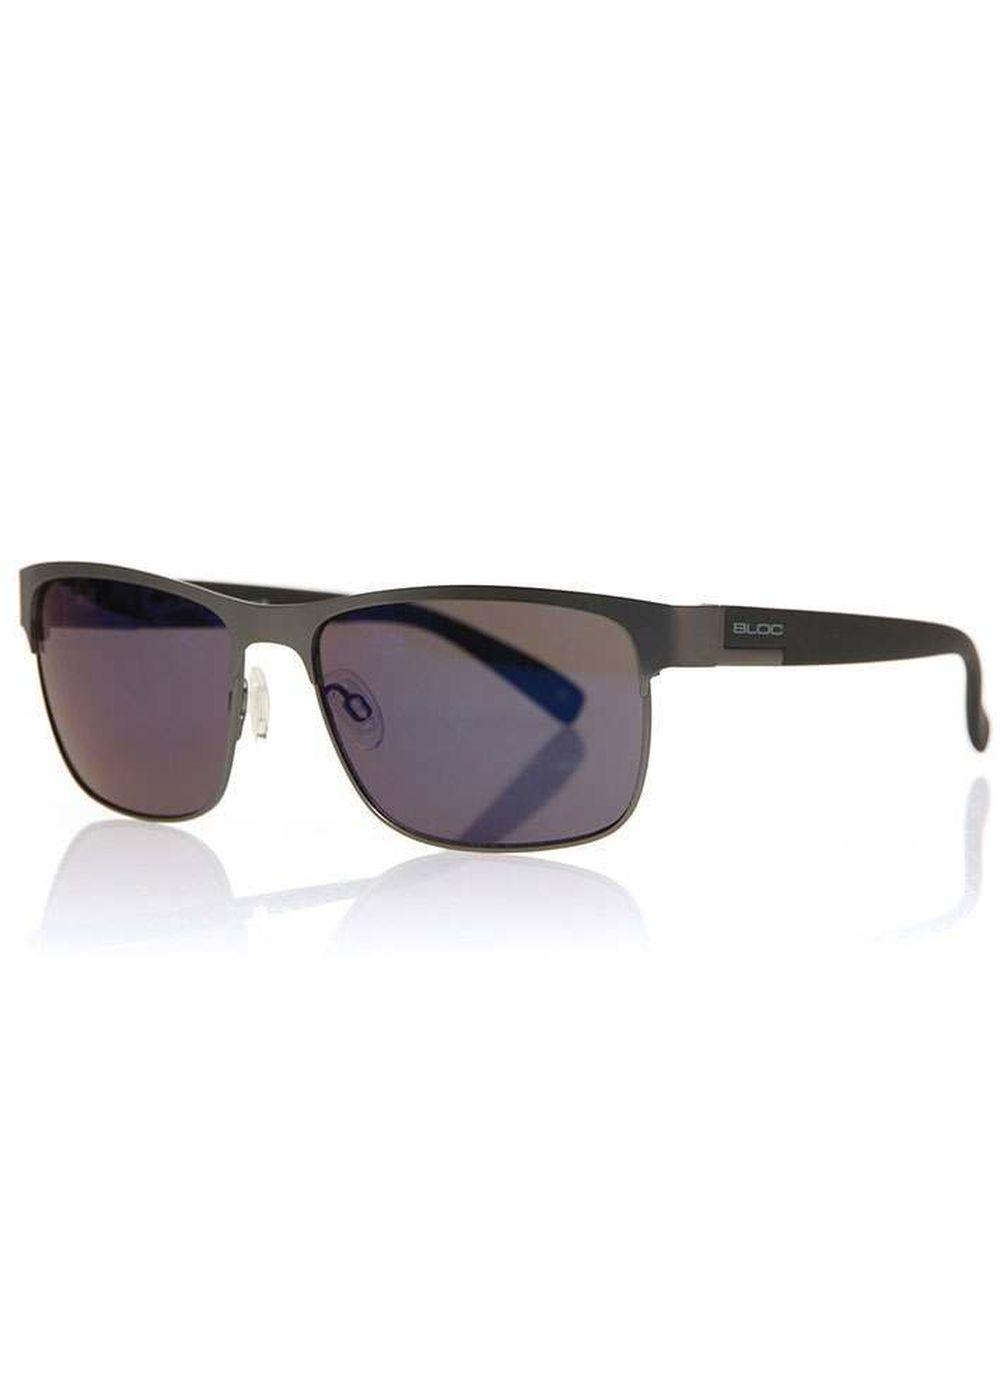 bloc-deck-sunglasses-matt-gunblue-mirror